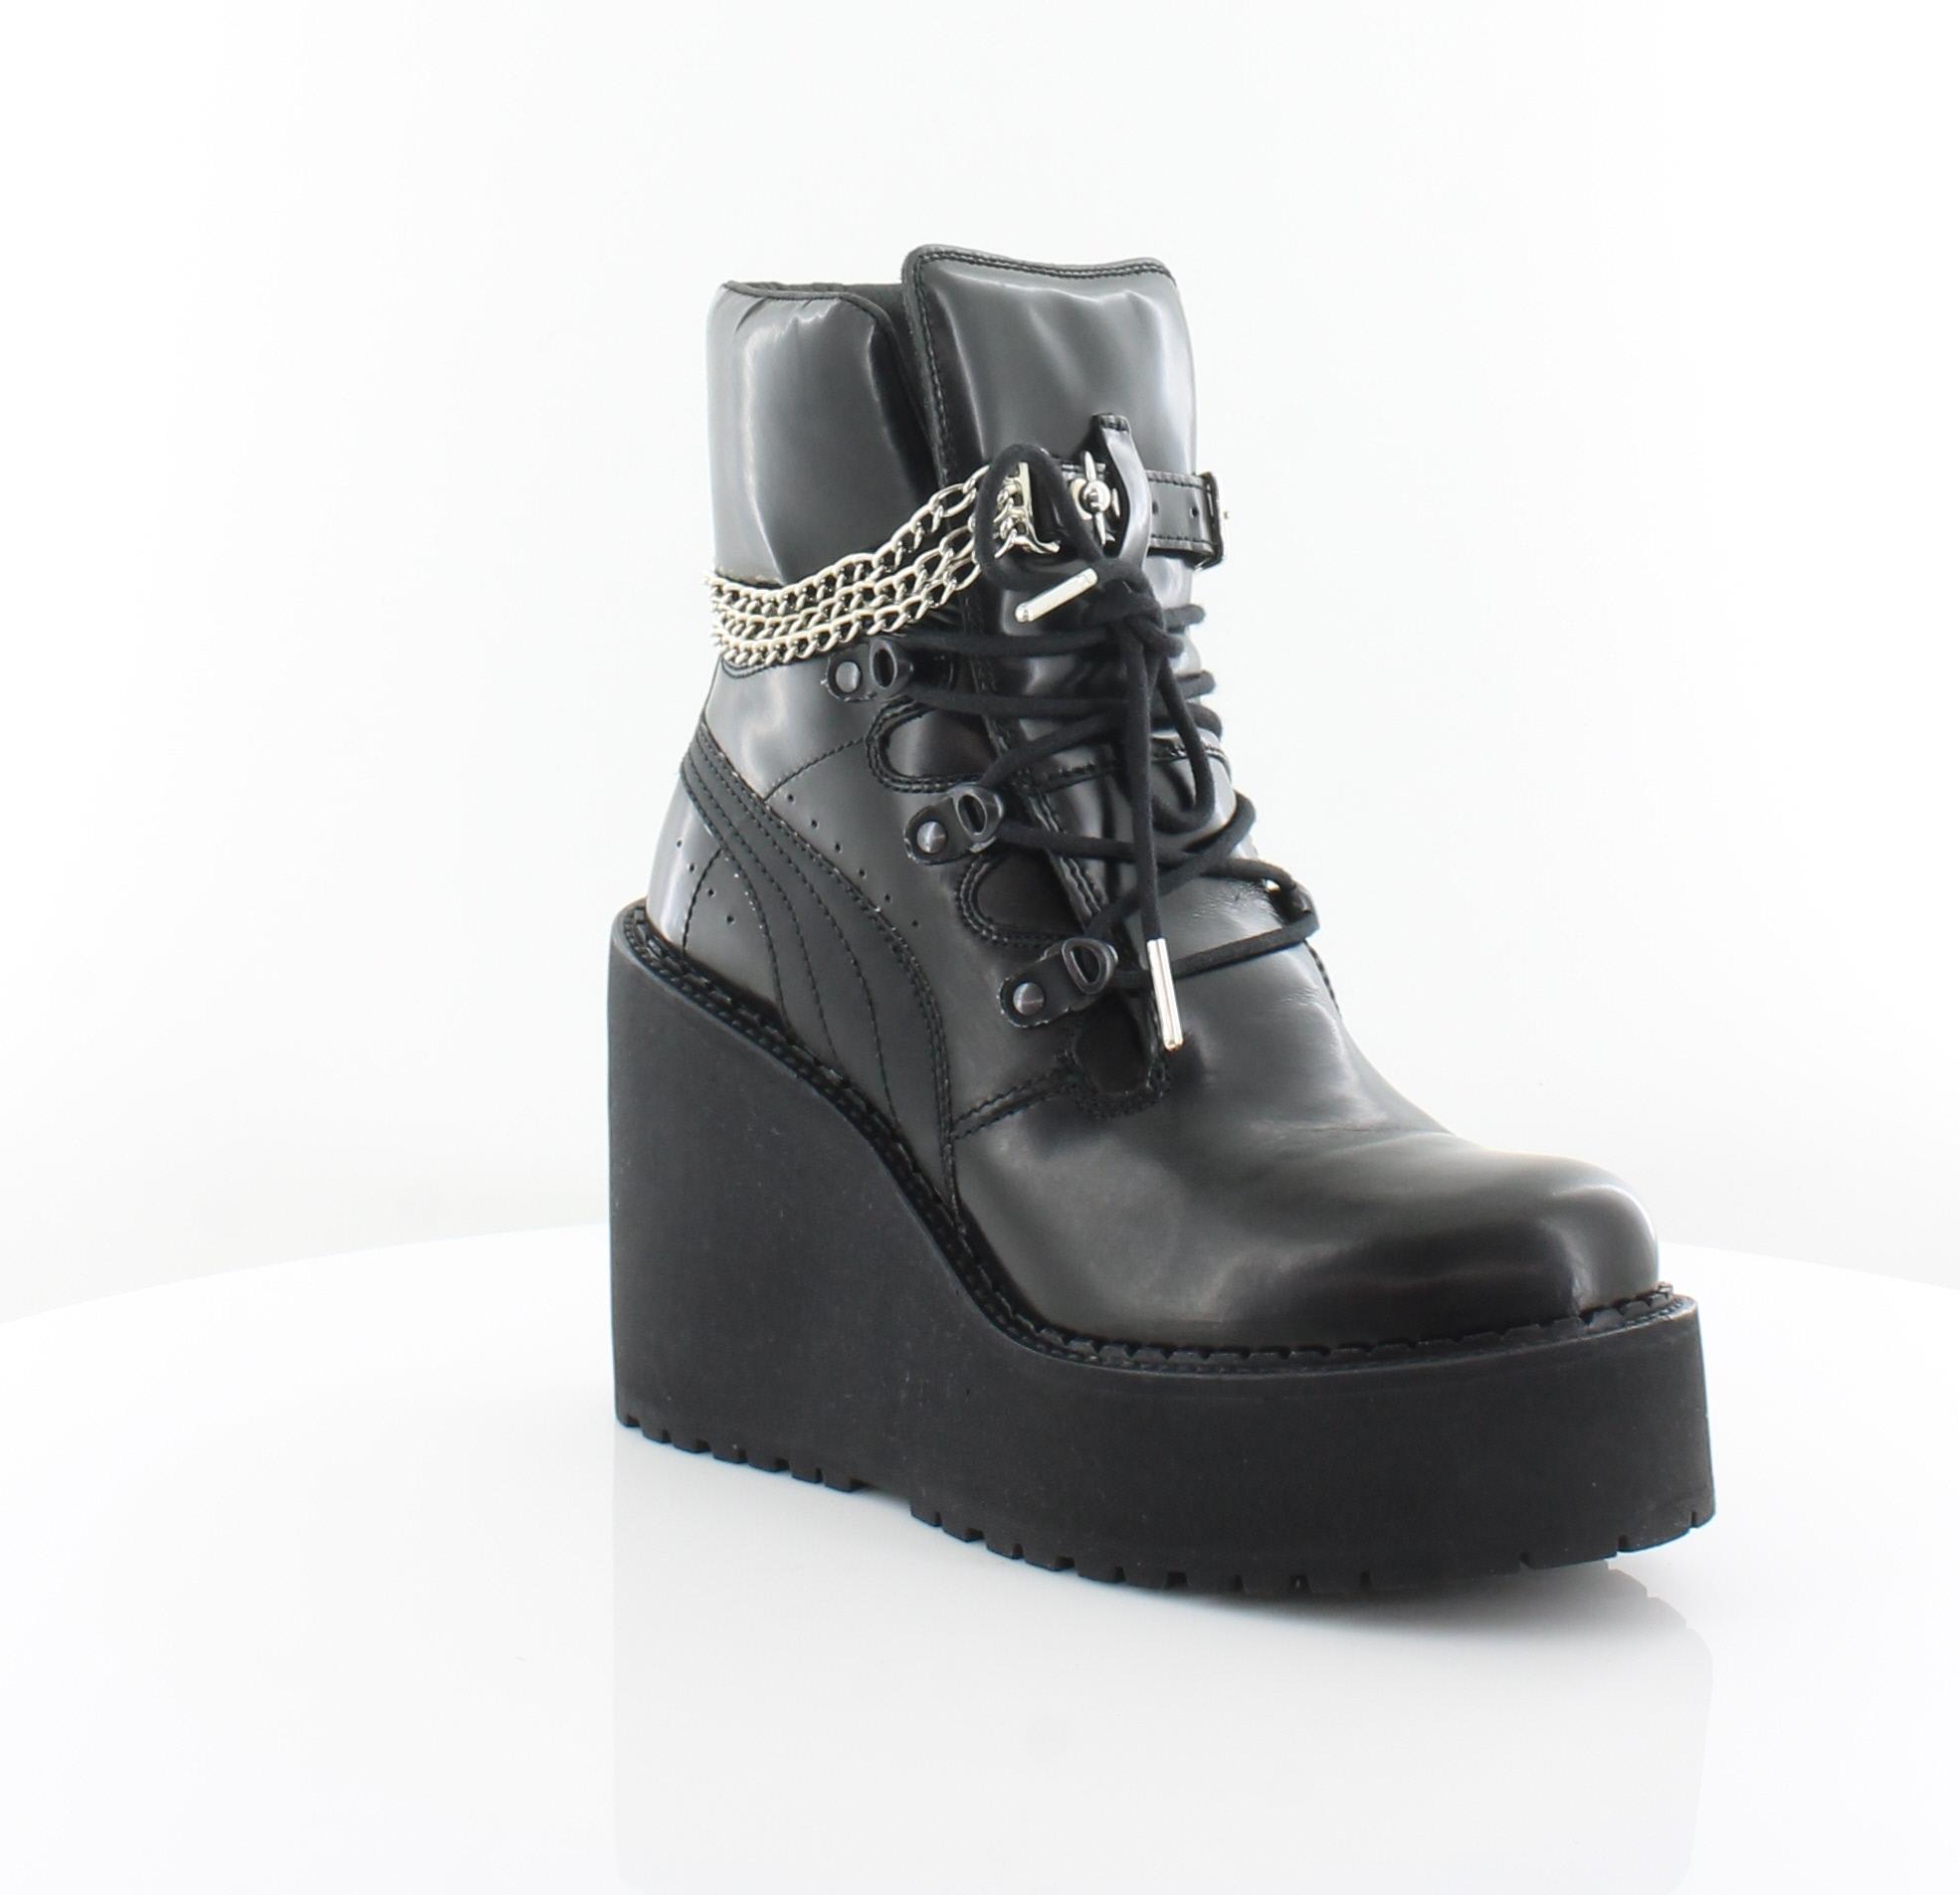 Details about Fenty Puma by Rihanna SB Wdg Rihanna Black Womens Shoes 8 M Boots MSRP $350